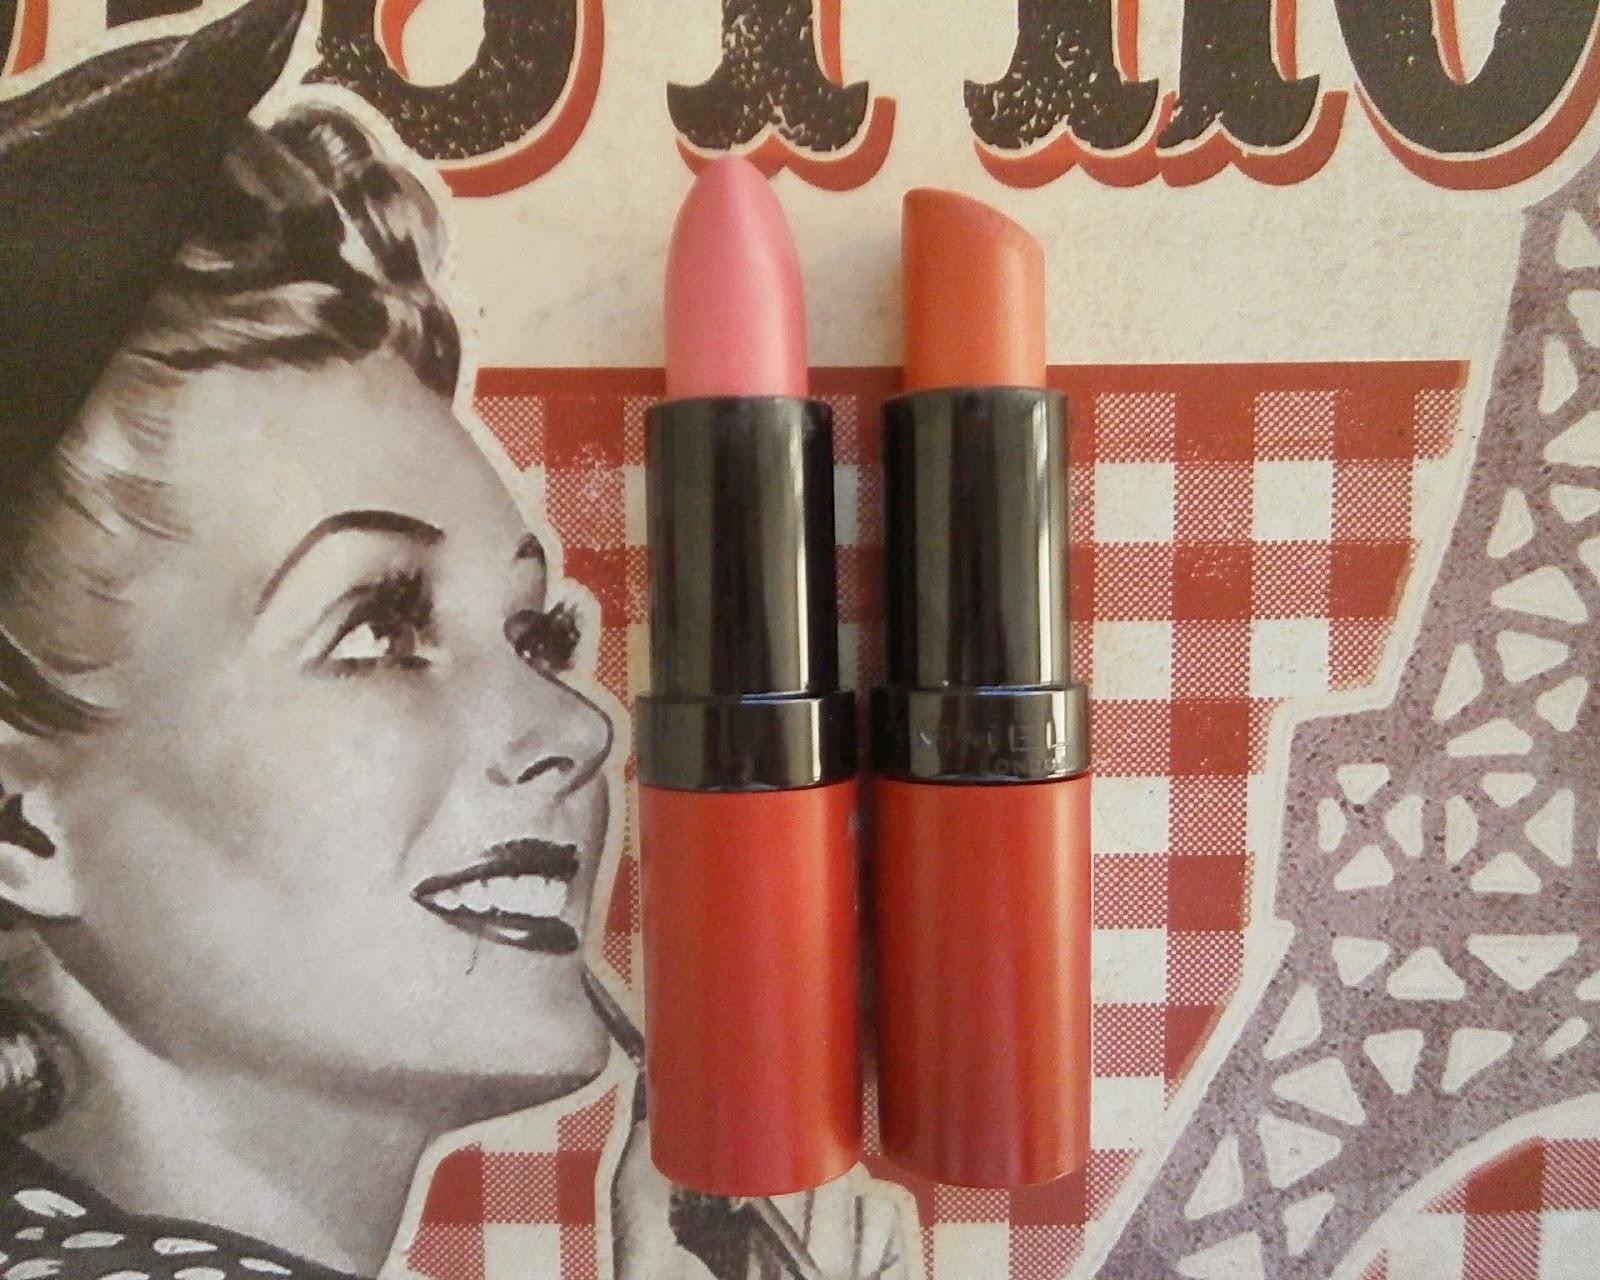 rimmel lasting finish matte by kate moss lipsticks